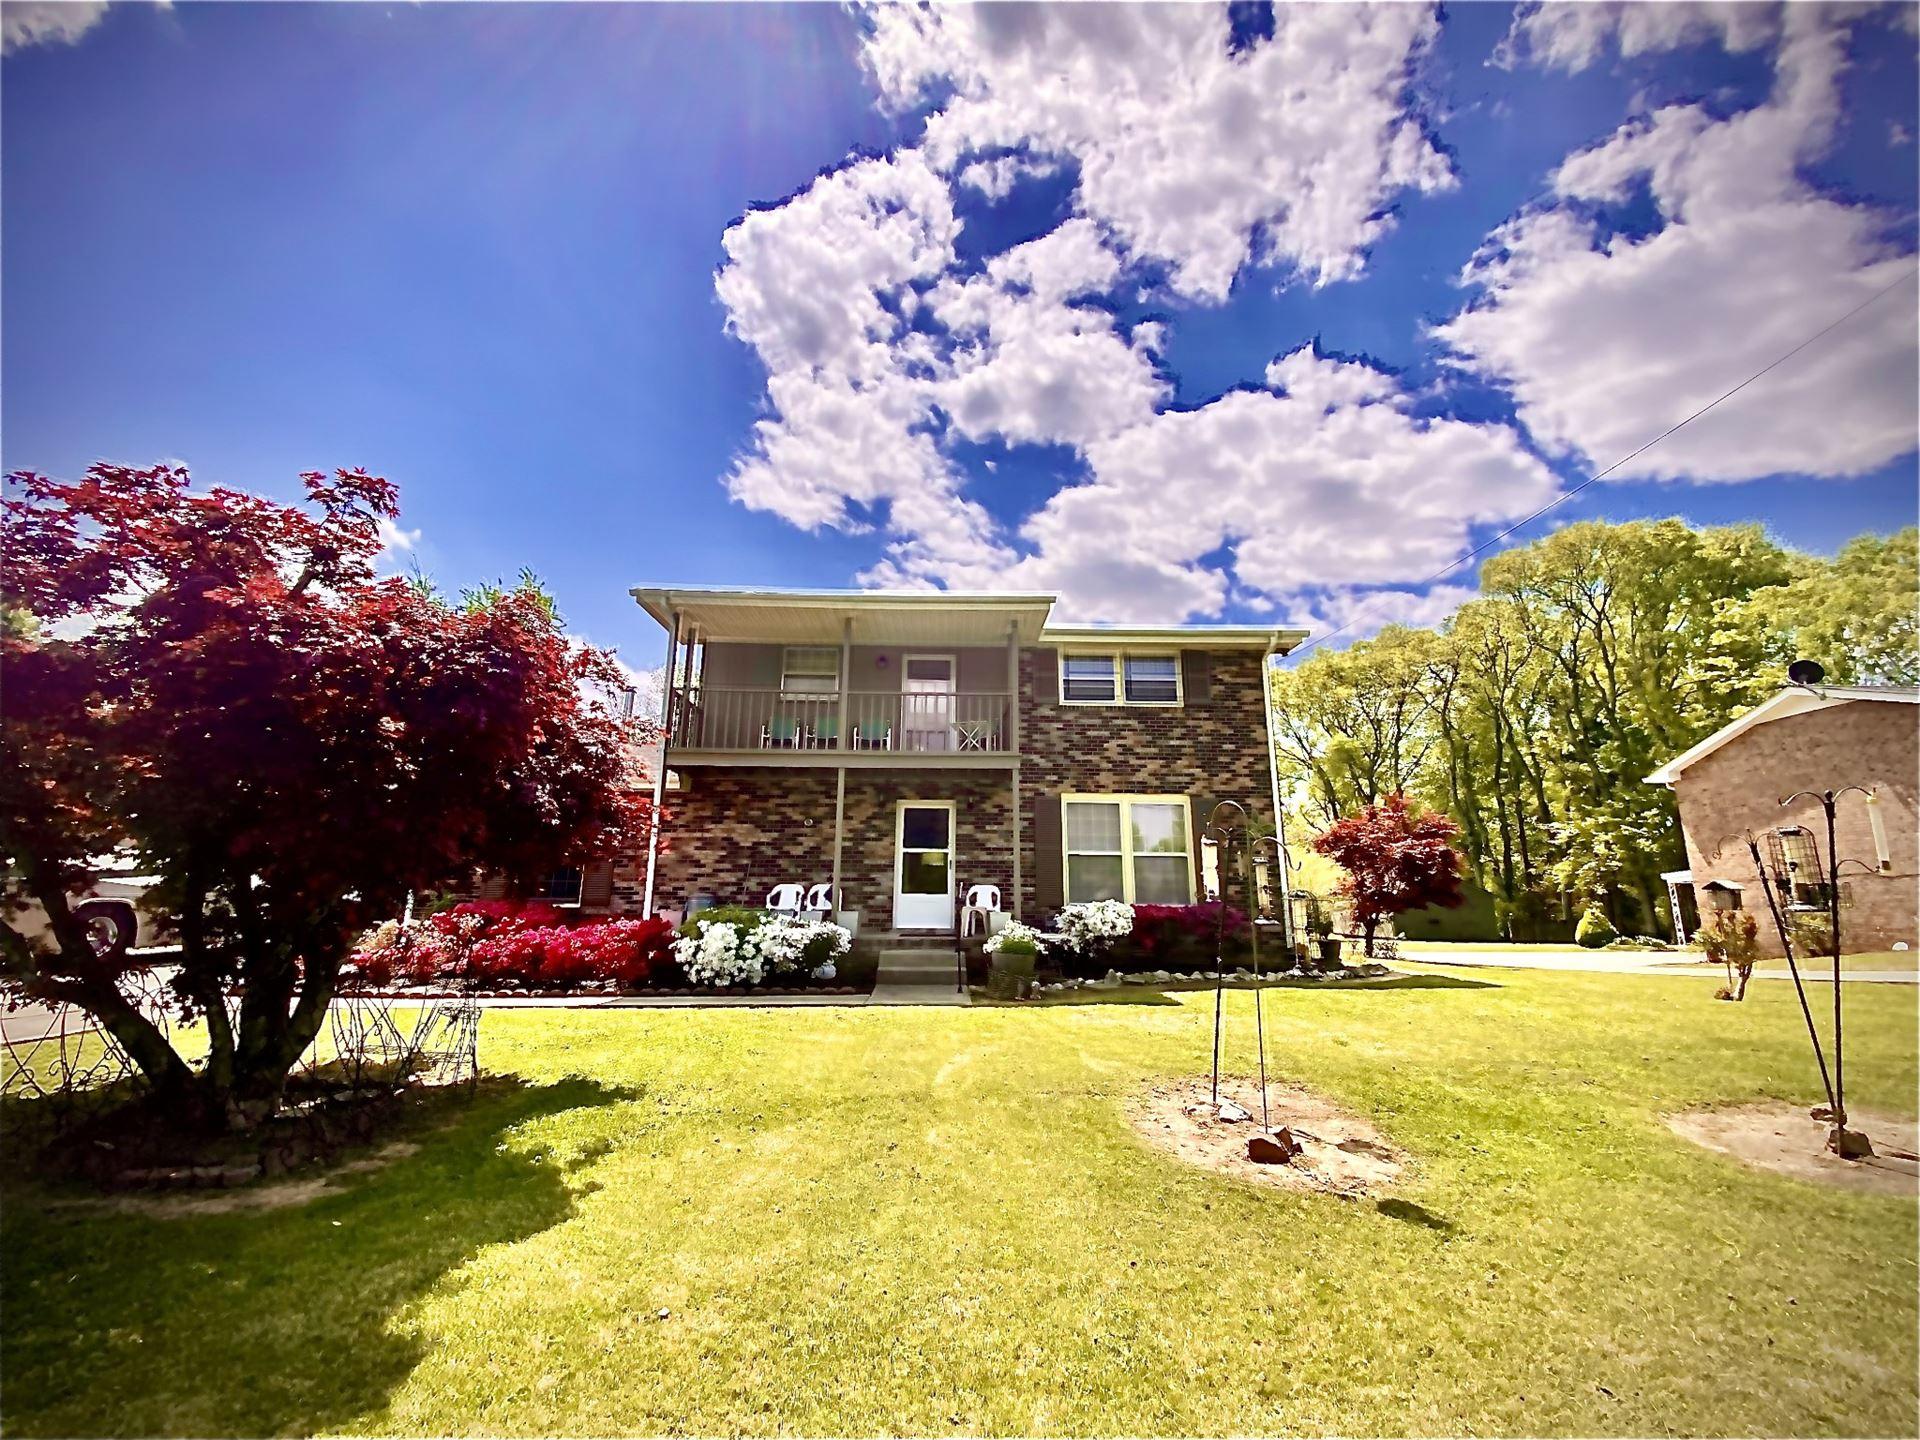 205 Green Harbor Rd, Old Hickory, TN 37138 - MLS#: 2247967